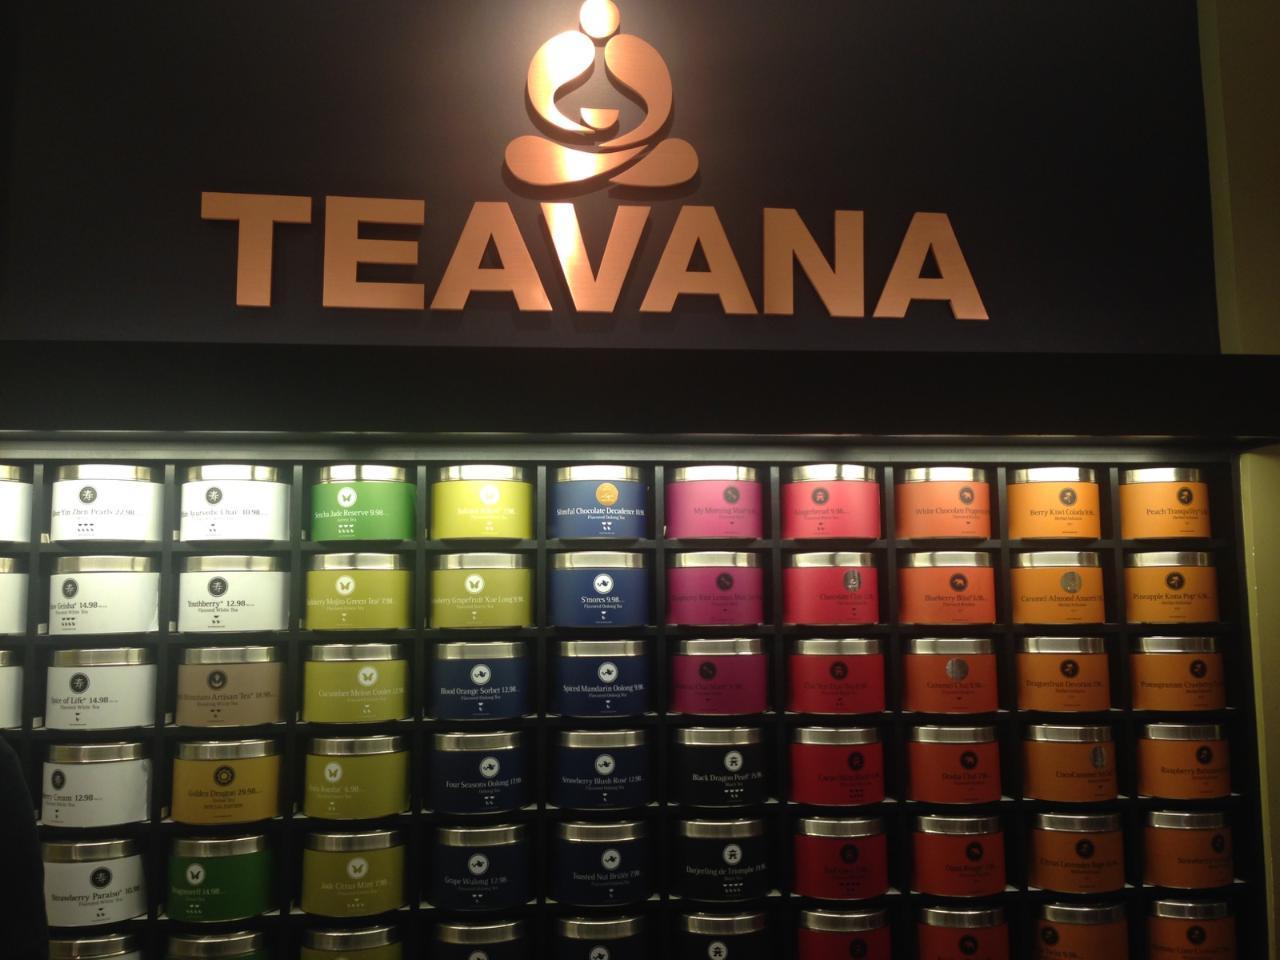 choosing the right tea